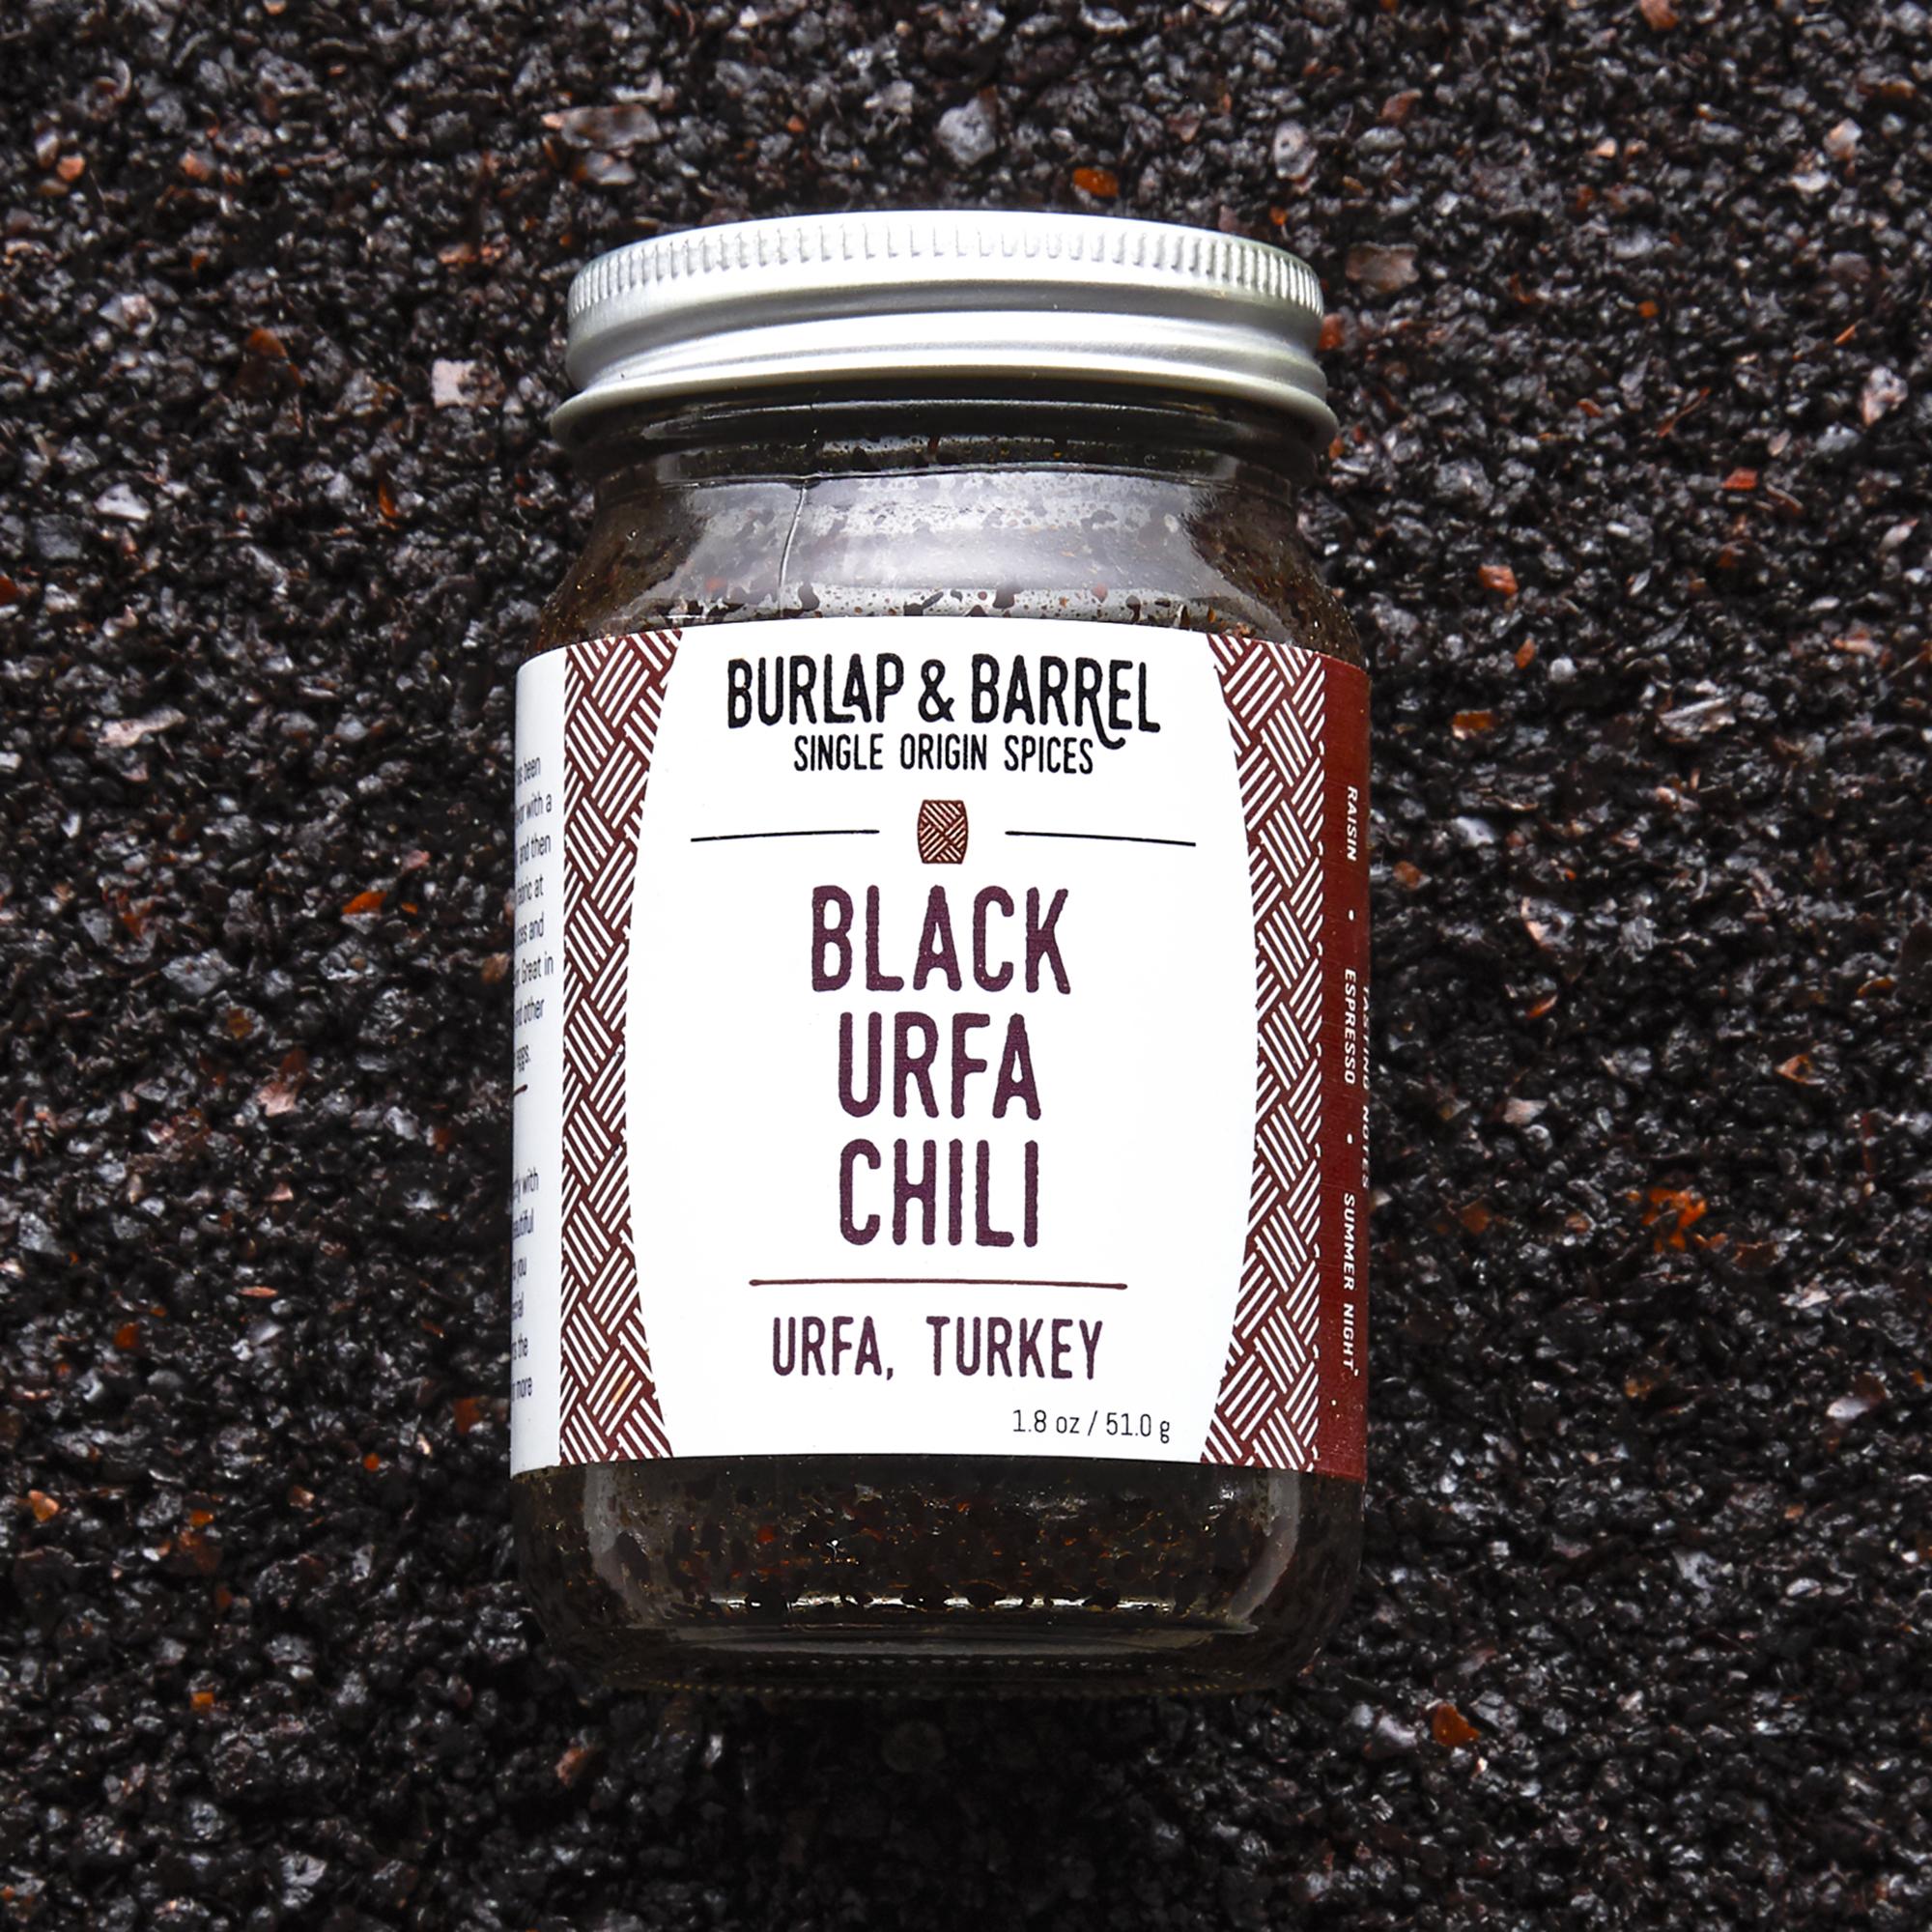 BLACK URFA CHILI  - 1.8 OZ GLASS JAR.jpg